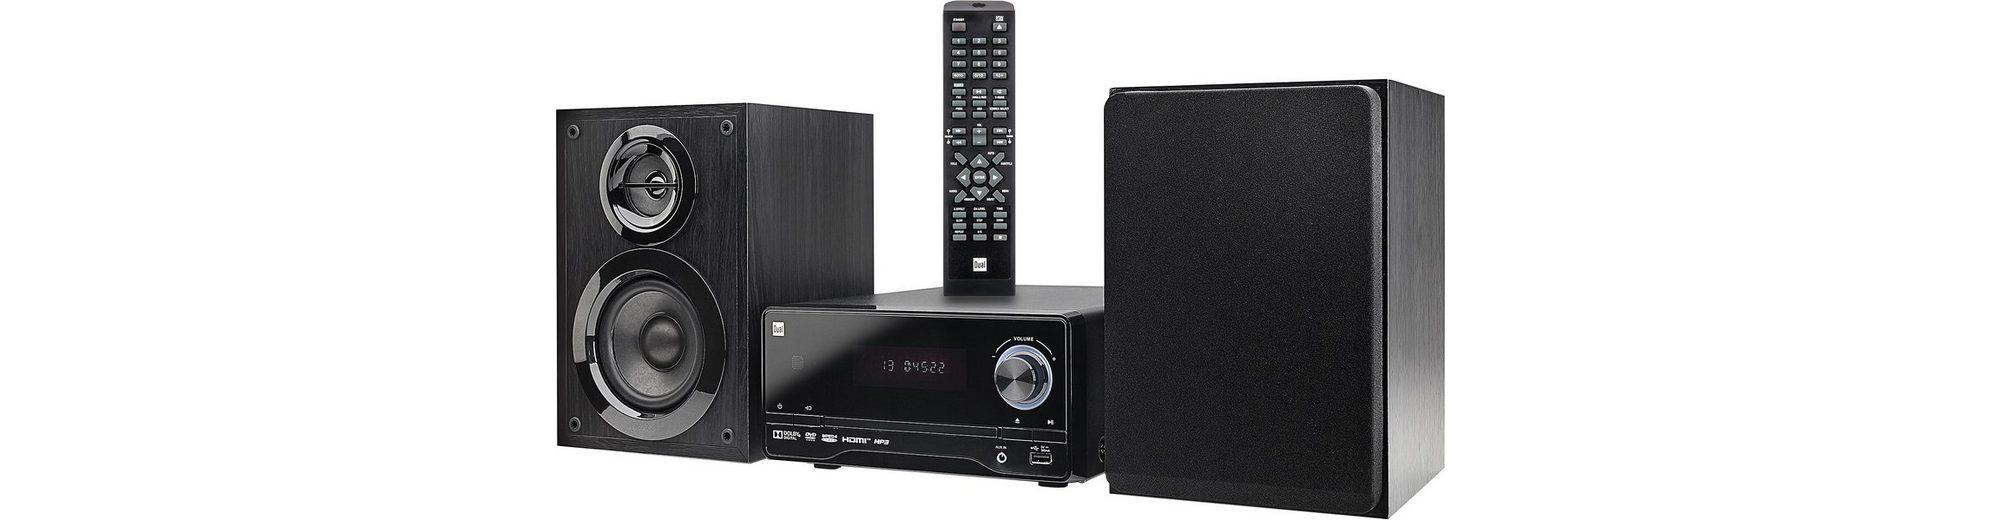 Dual DVD-MS 120 Microanlage, RDS, 1x USB